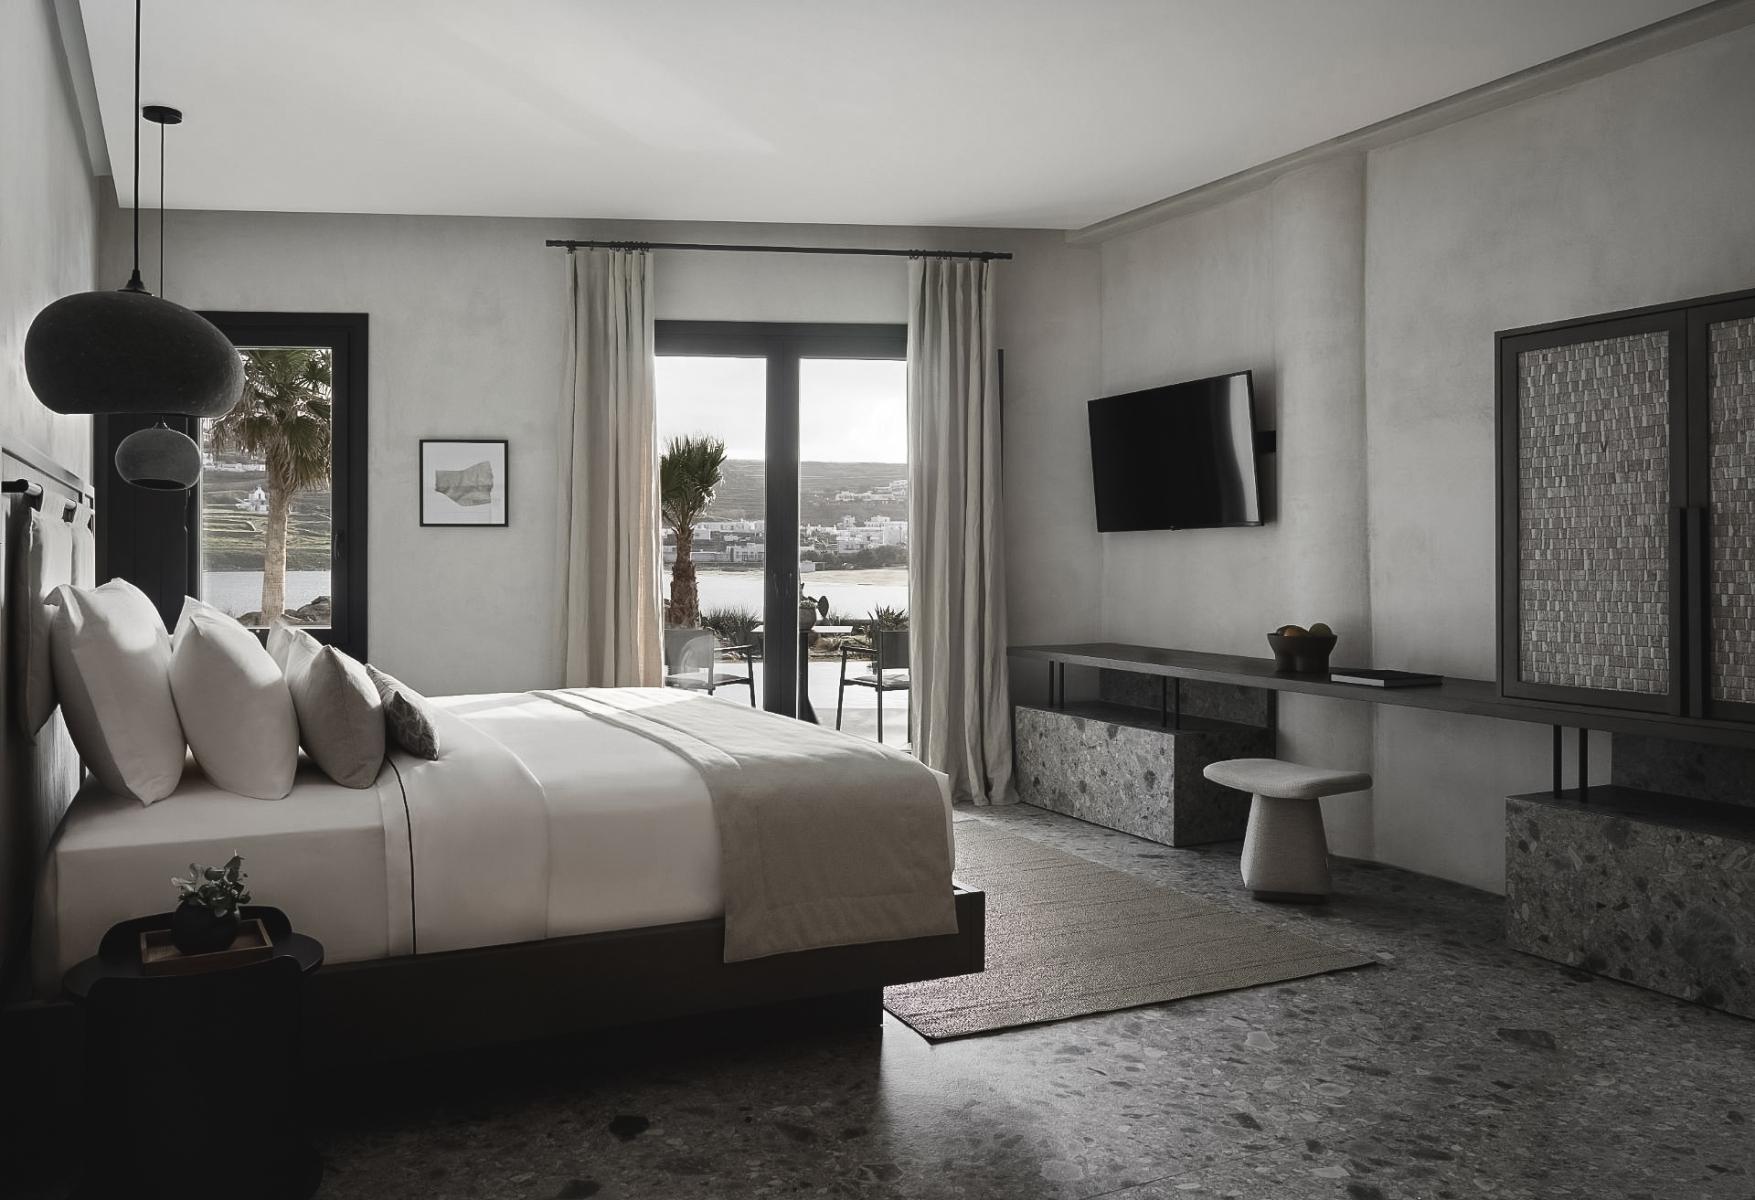 1_9_Aeonic-Suites-Spa-Luxury-Hotel-Mykonos-55